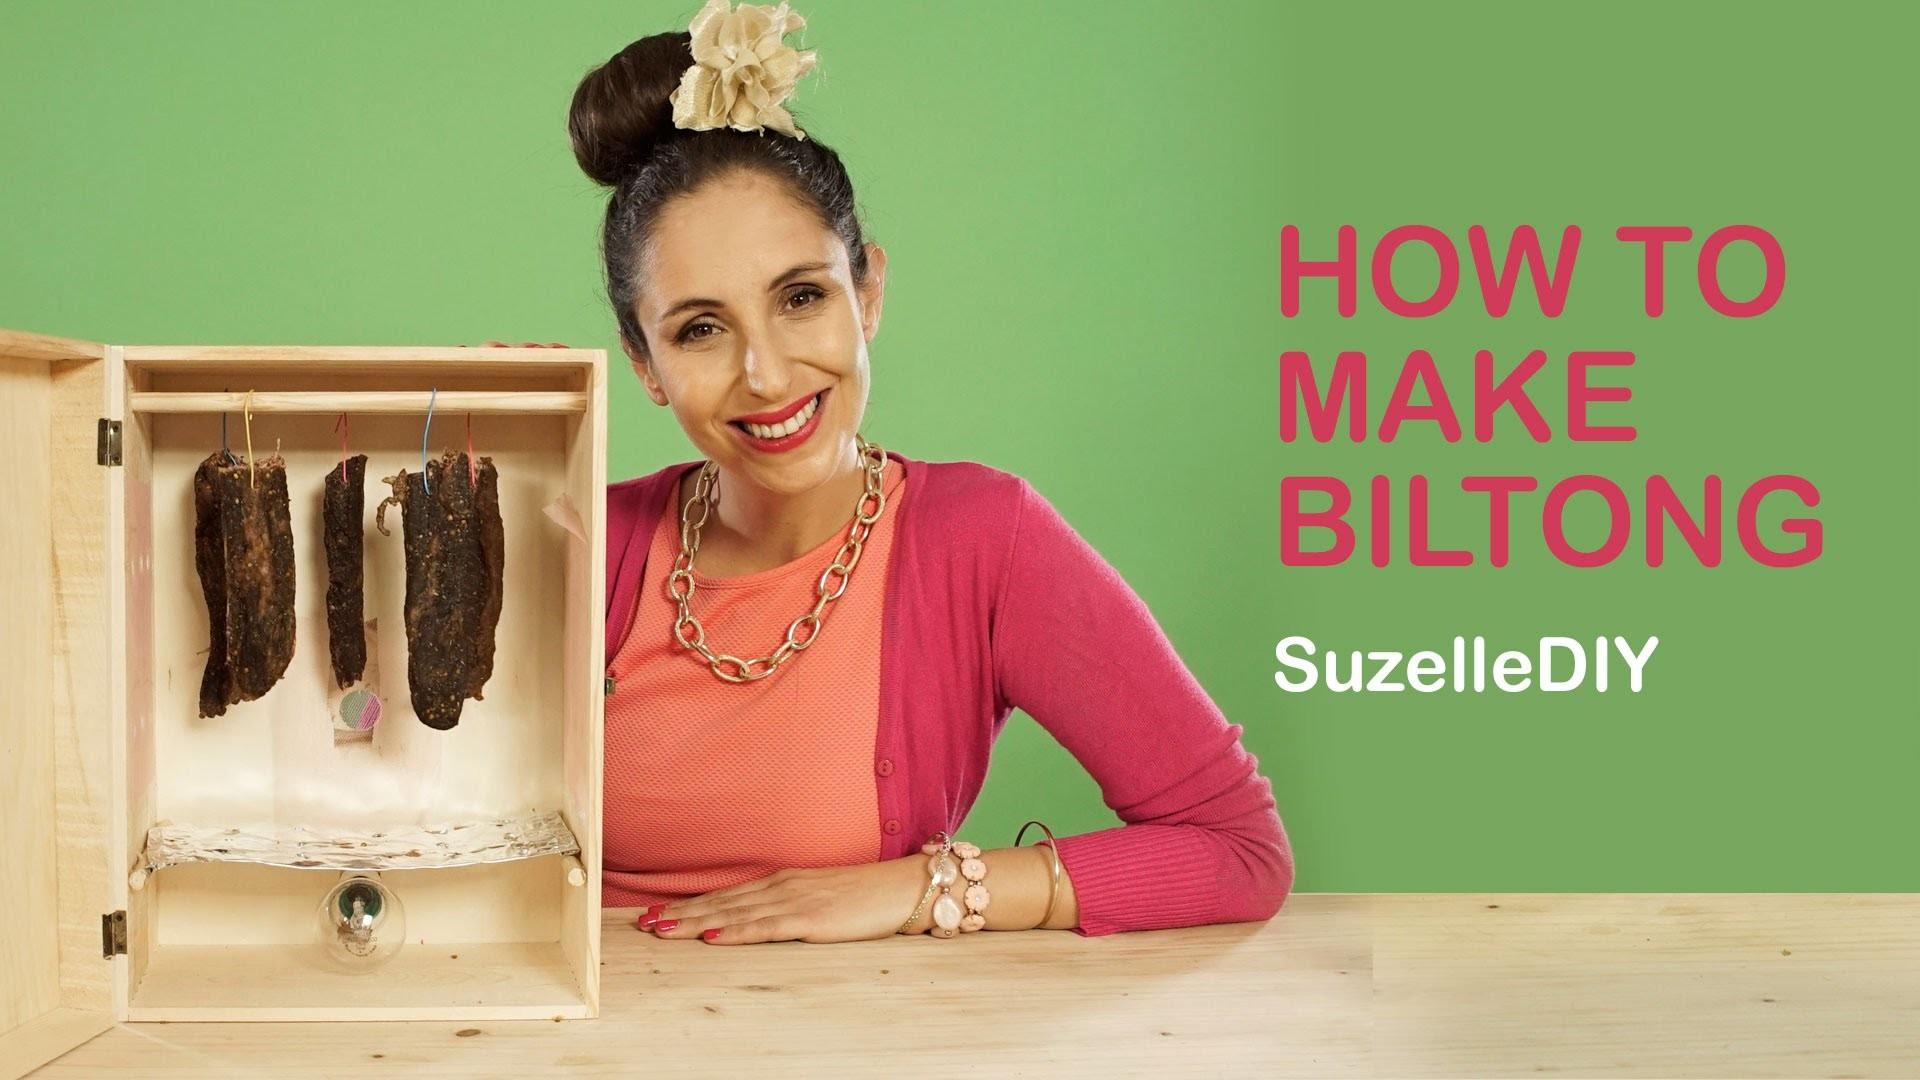 SuzelleDIY - How to Make Biltong